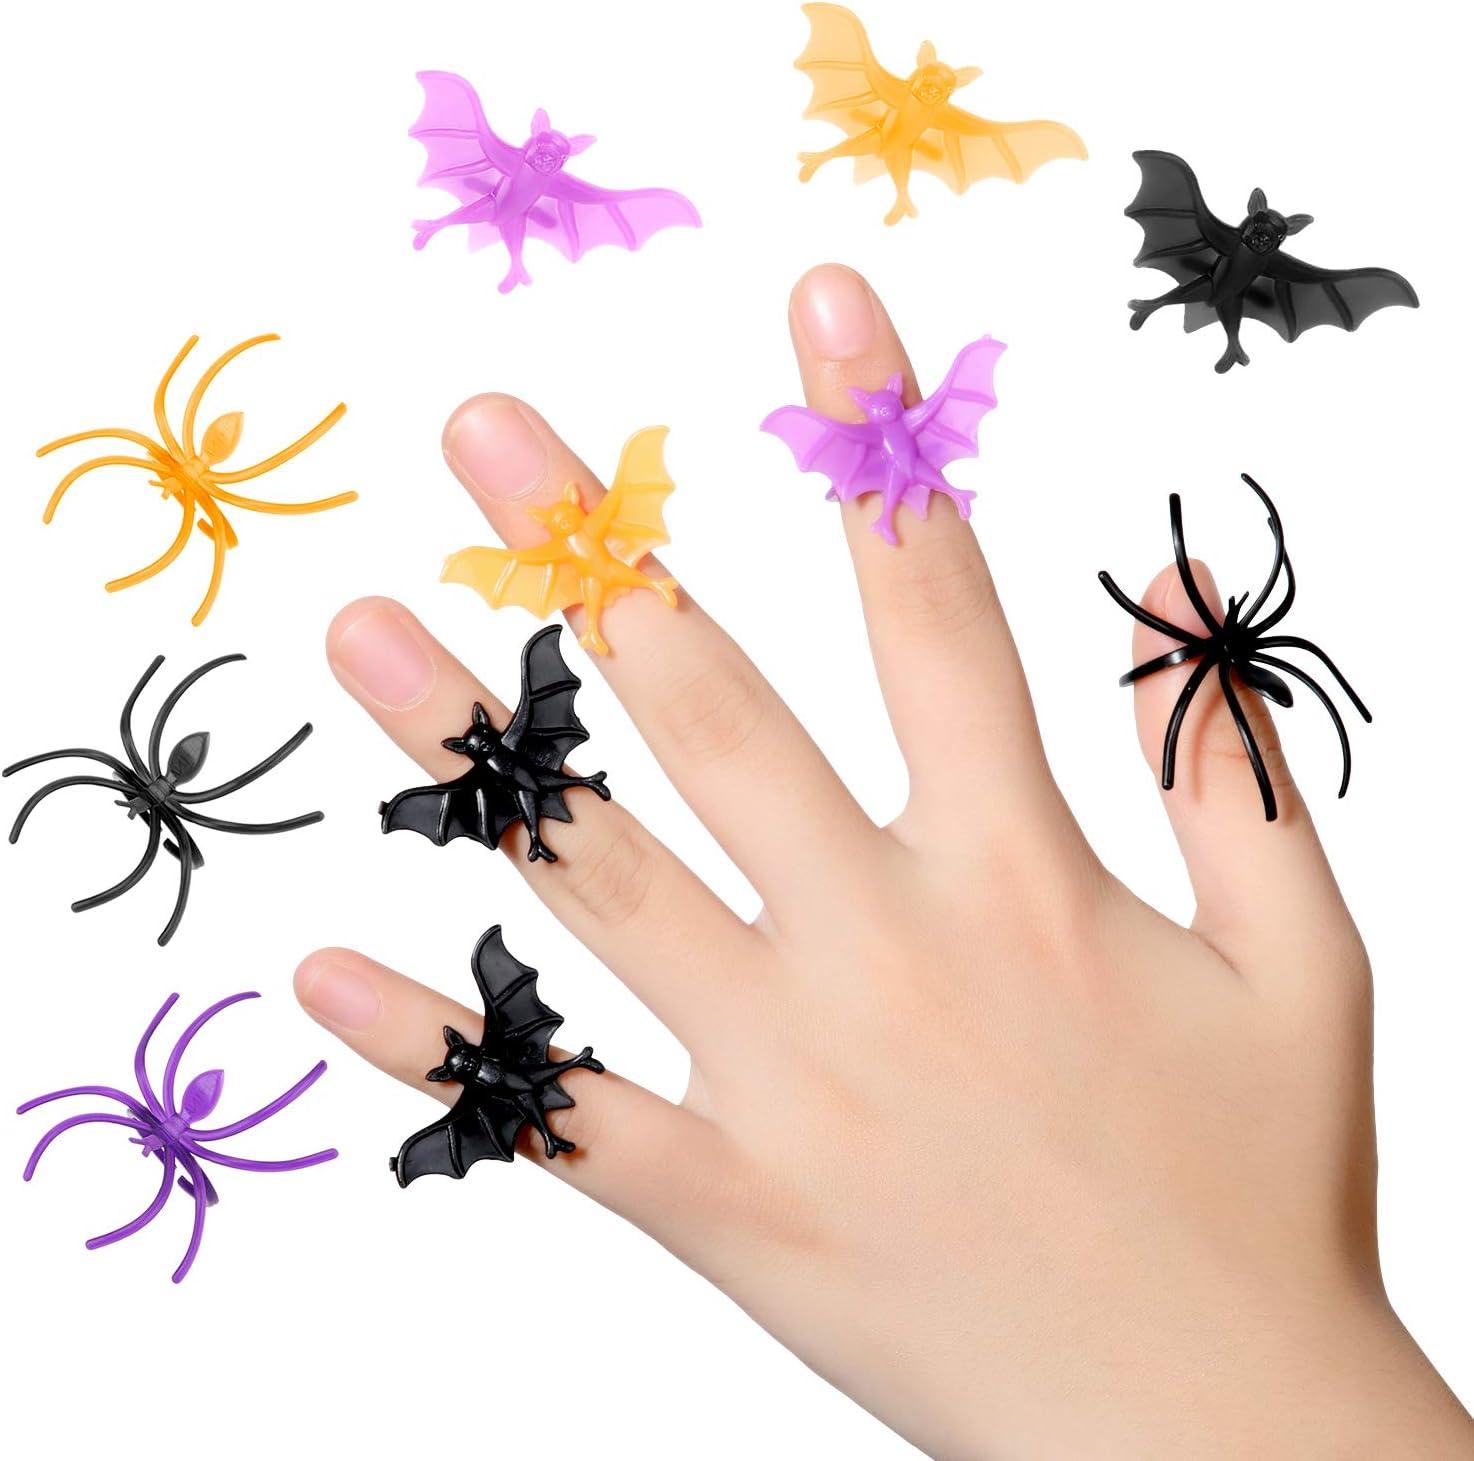 Boao 144 Pieces Halloween Spider Rings Plastic Bat Rings Halloween Trick or Treat Rings for Kids Adults Halloween Favor 3 Colors